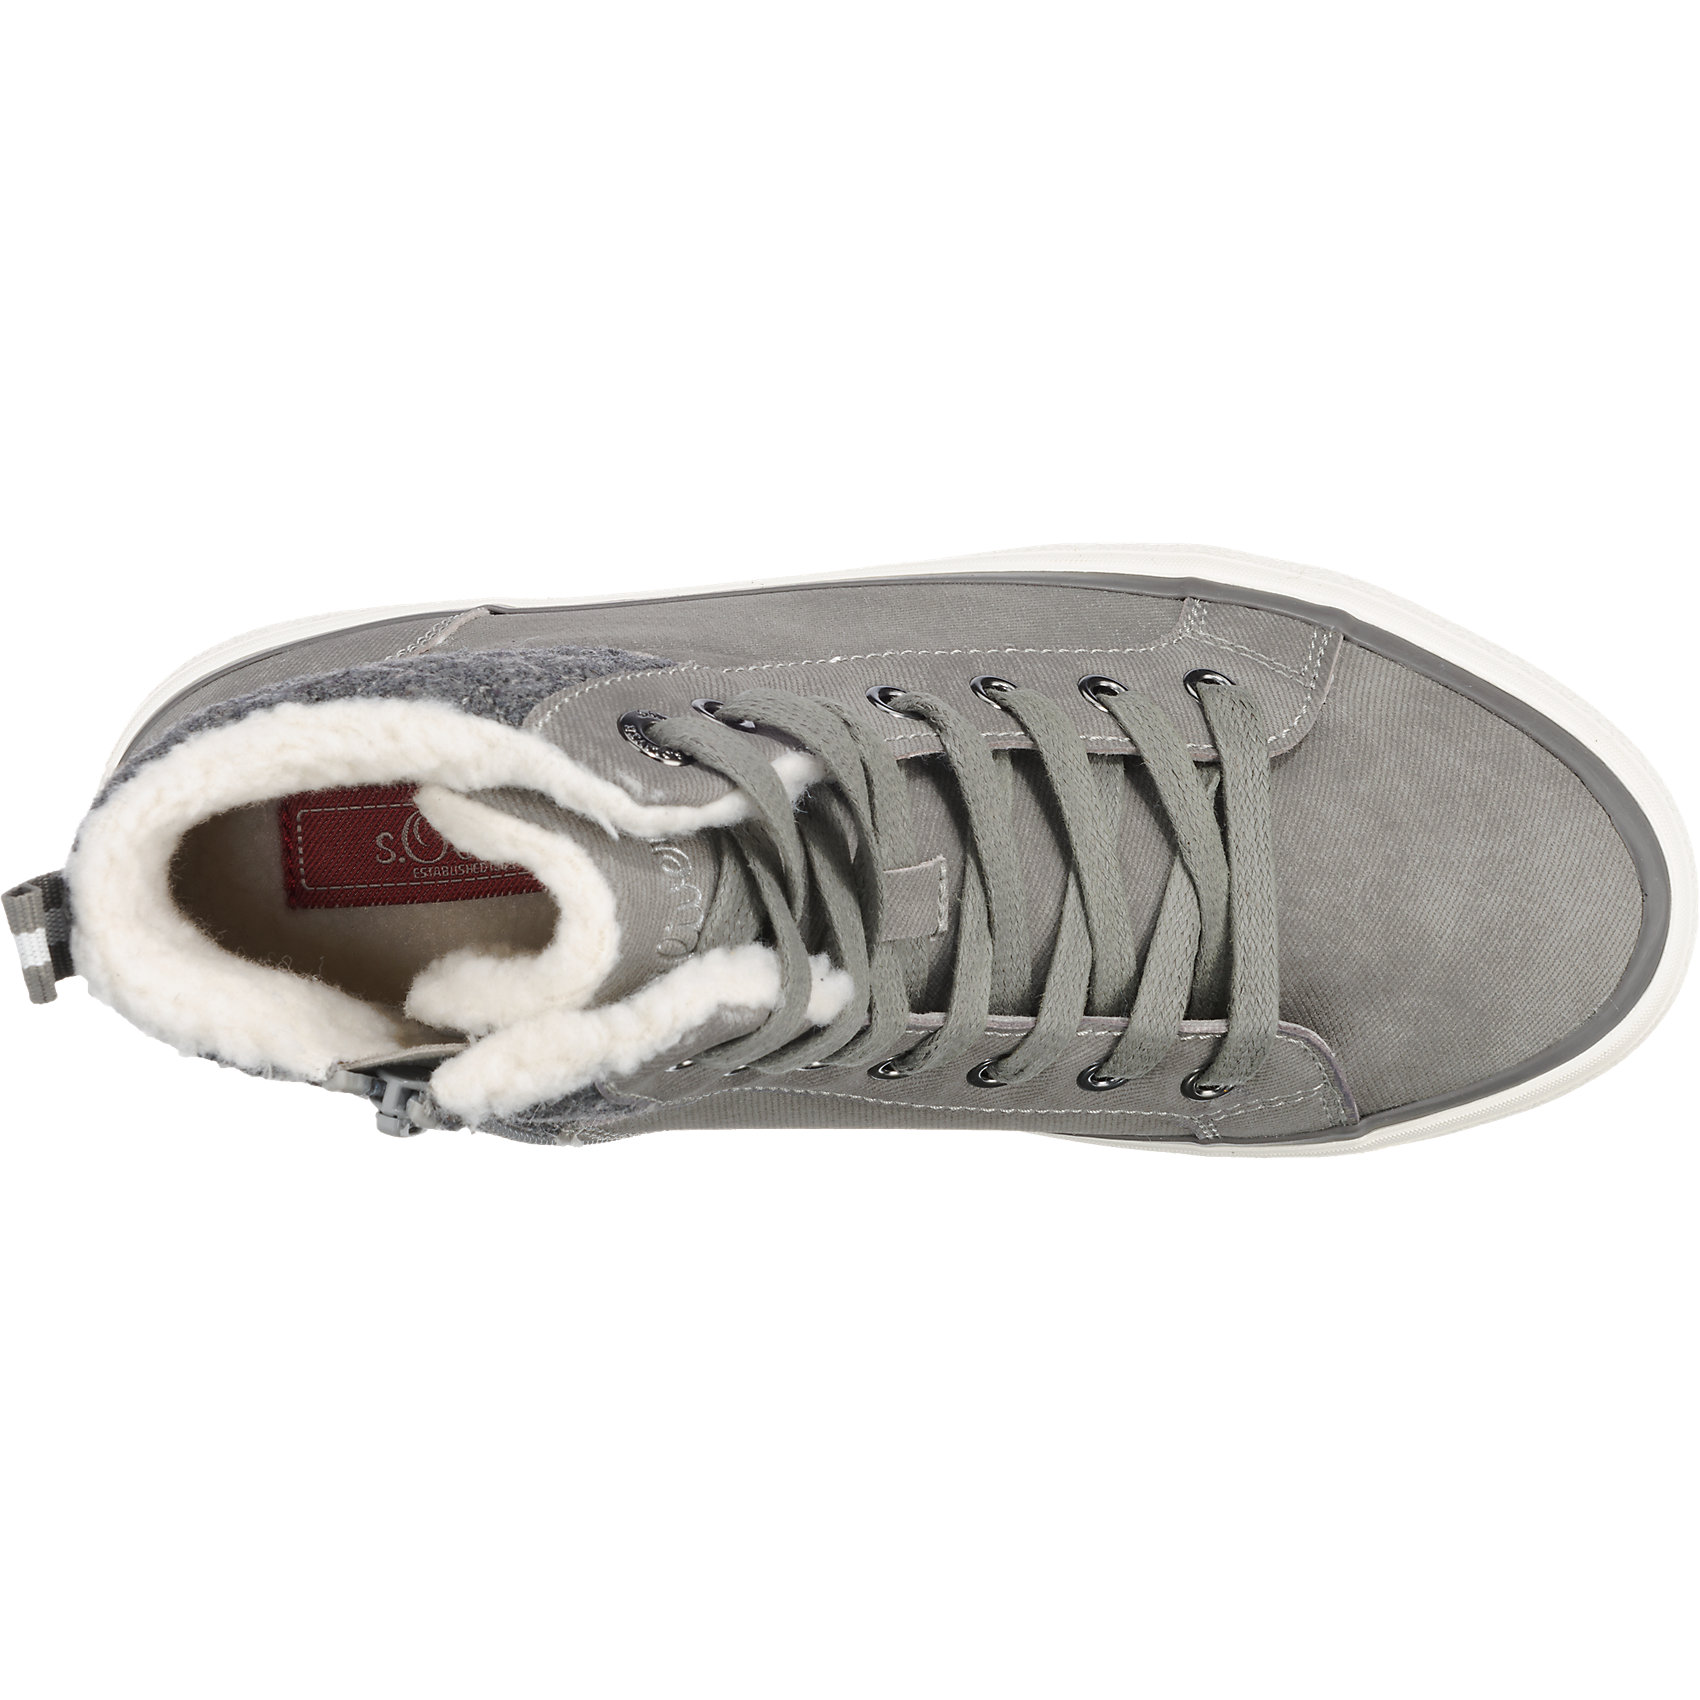 450a79c87fc6 ... Nike Nike Nike SB Bruin Zoom PRM SE UK9 877045-811 EUR44 US10 Red  Orange ...